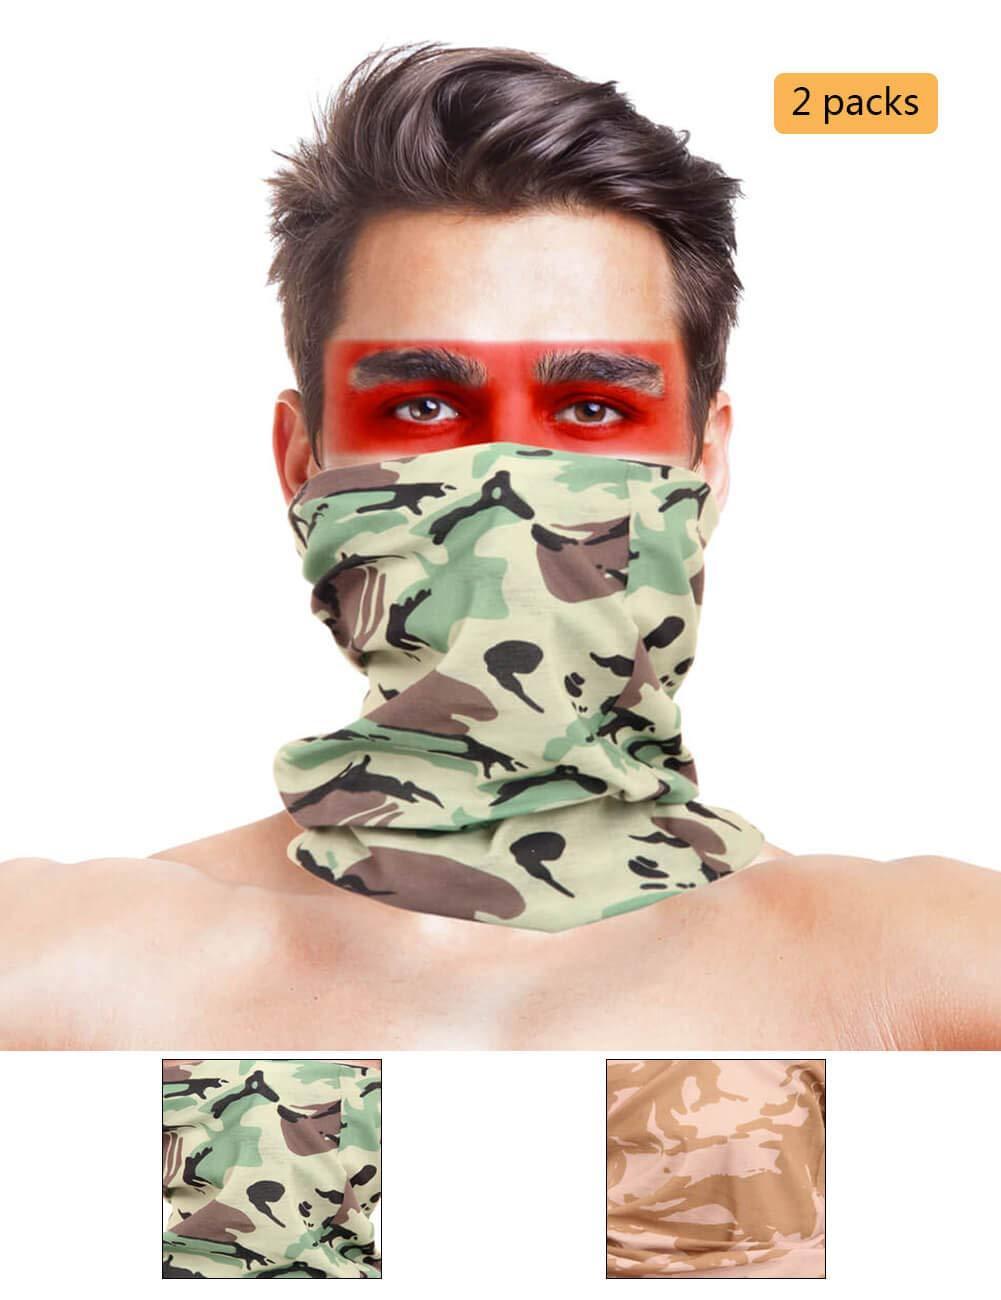 LOOGU 12-in-1 Headband Hunting Blind Tree Camo Multifunctional Seamless Bandanas Headwear (British DPM 2-1, 9.5 x 19 Inches / 24 x 49 cm)